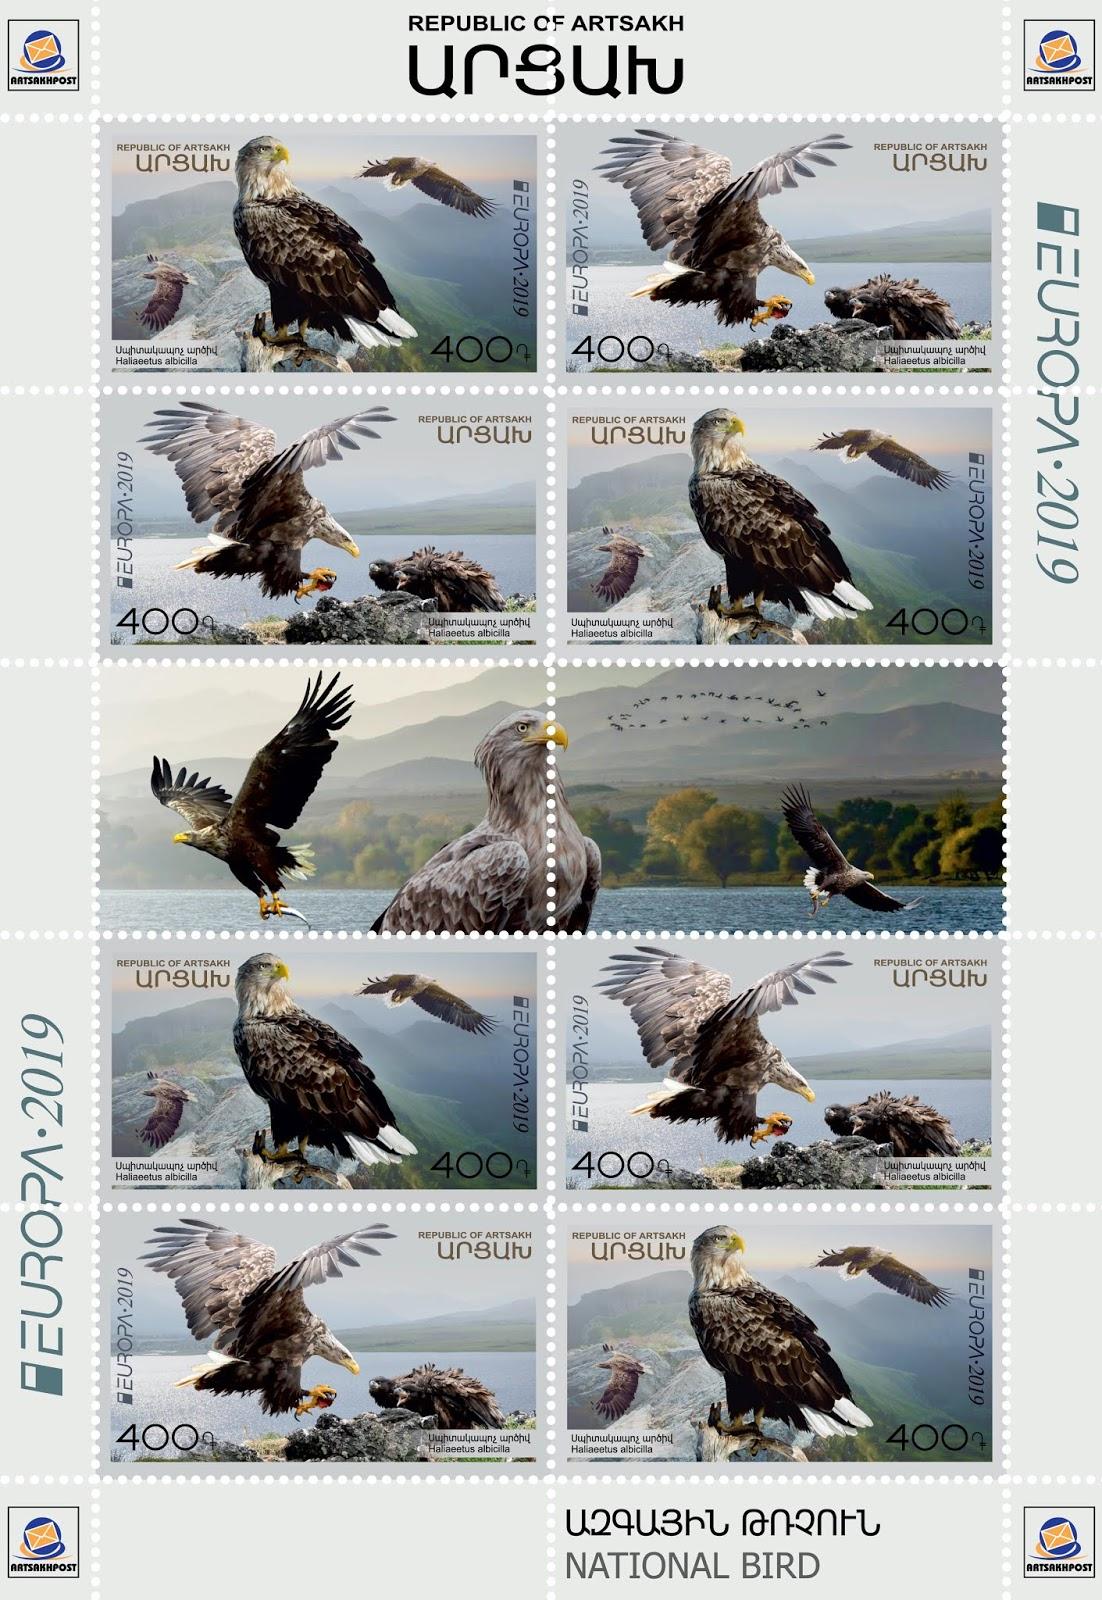 Artsakh - National Birds, Europa (March 22, 2019) sheet of 10, 2 designs